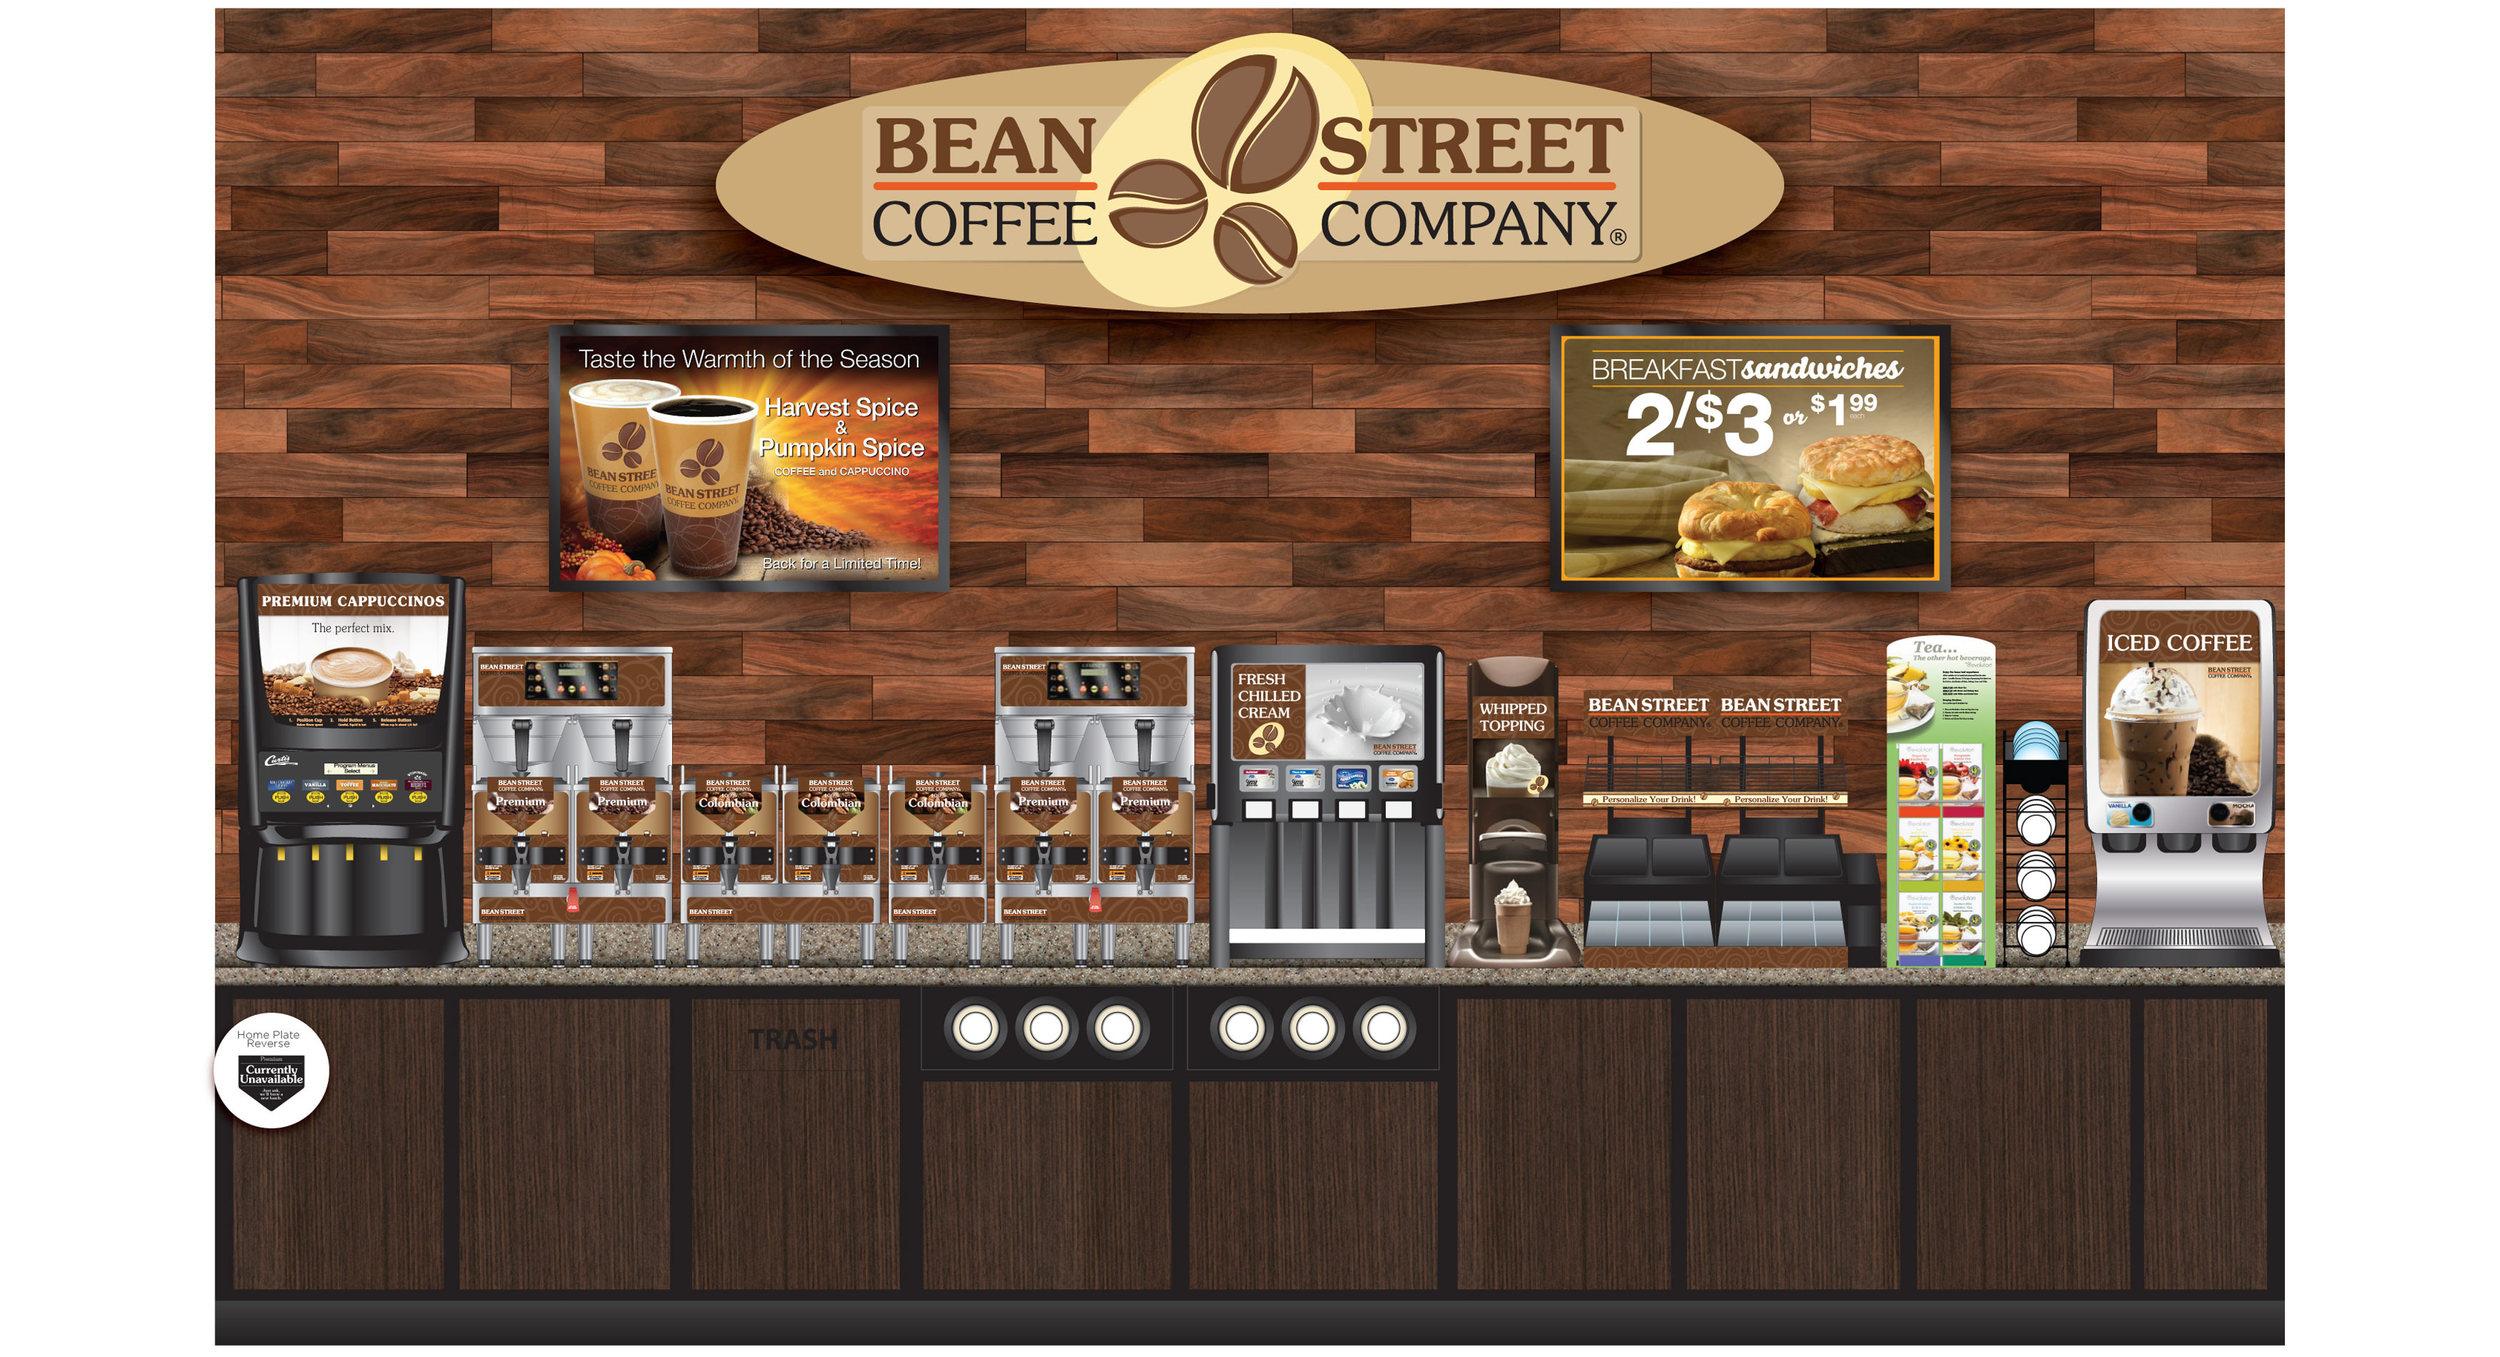 CircleK-KEOTR-BeanStreet-CoffeCounter.jpg